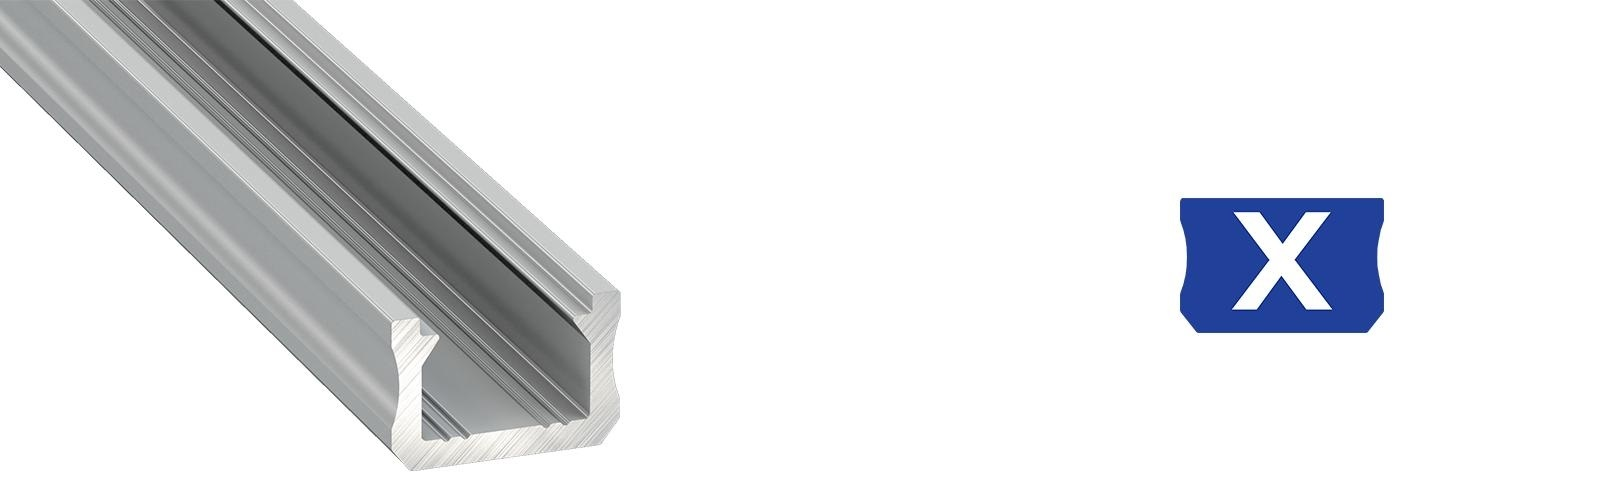 Profil LED wąski typ X